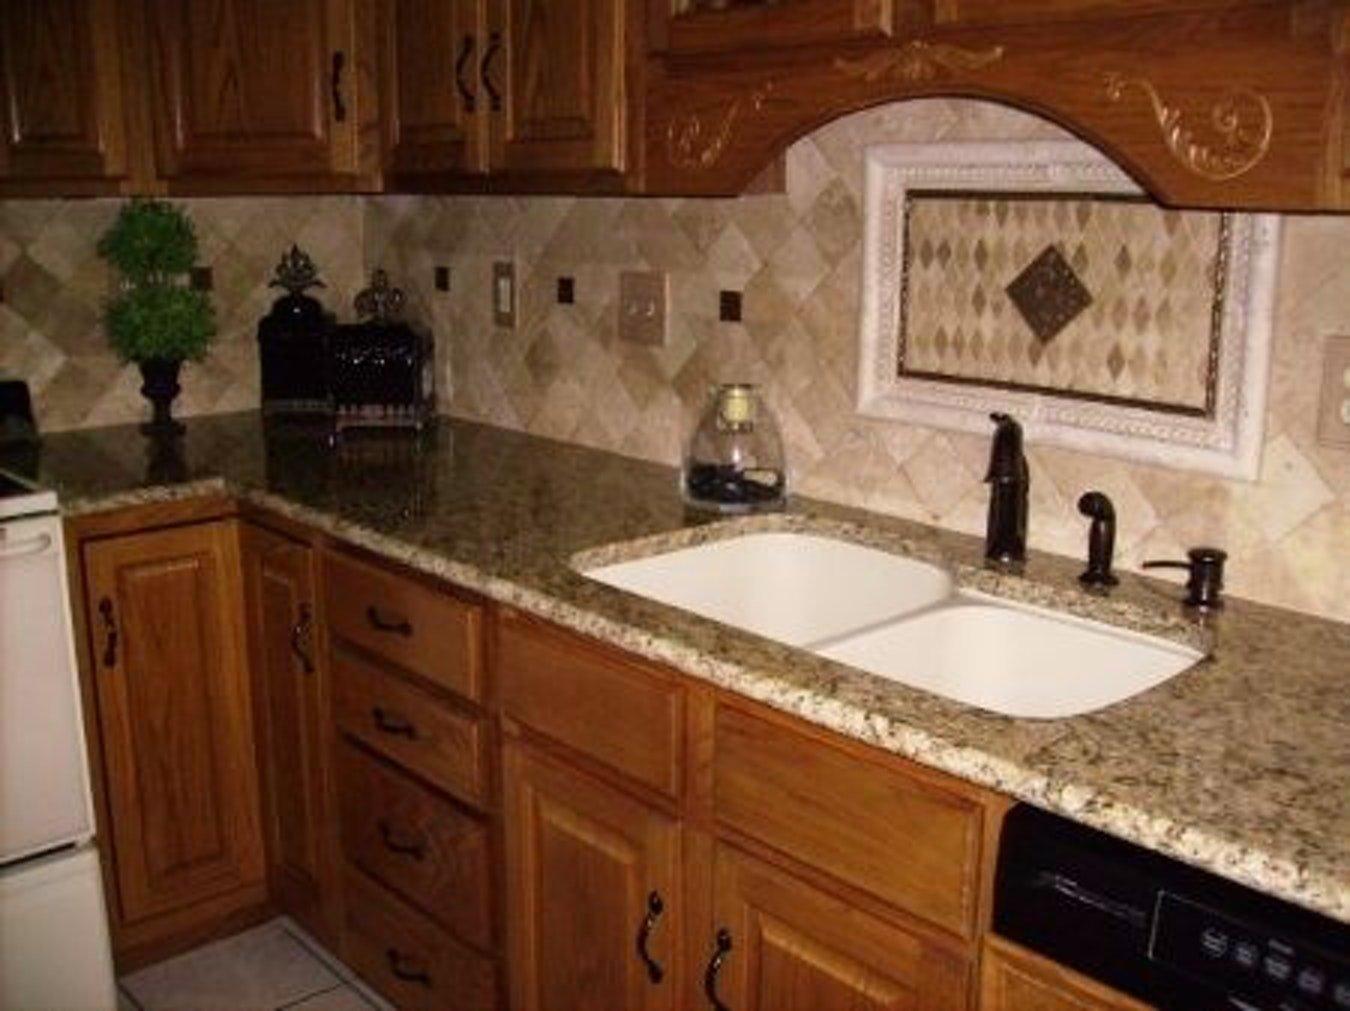 10 Amazing New Venetian Gold Granite Backsplash Ideas new venetian gold granite countertops backsplash tile ideas divine 2021